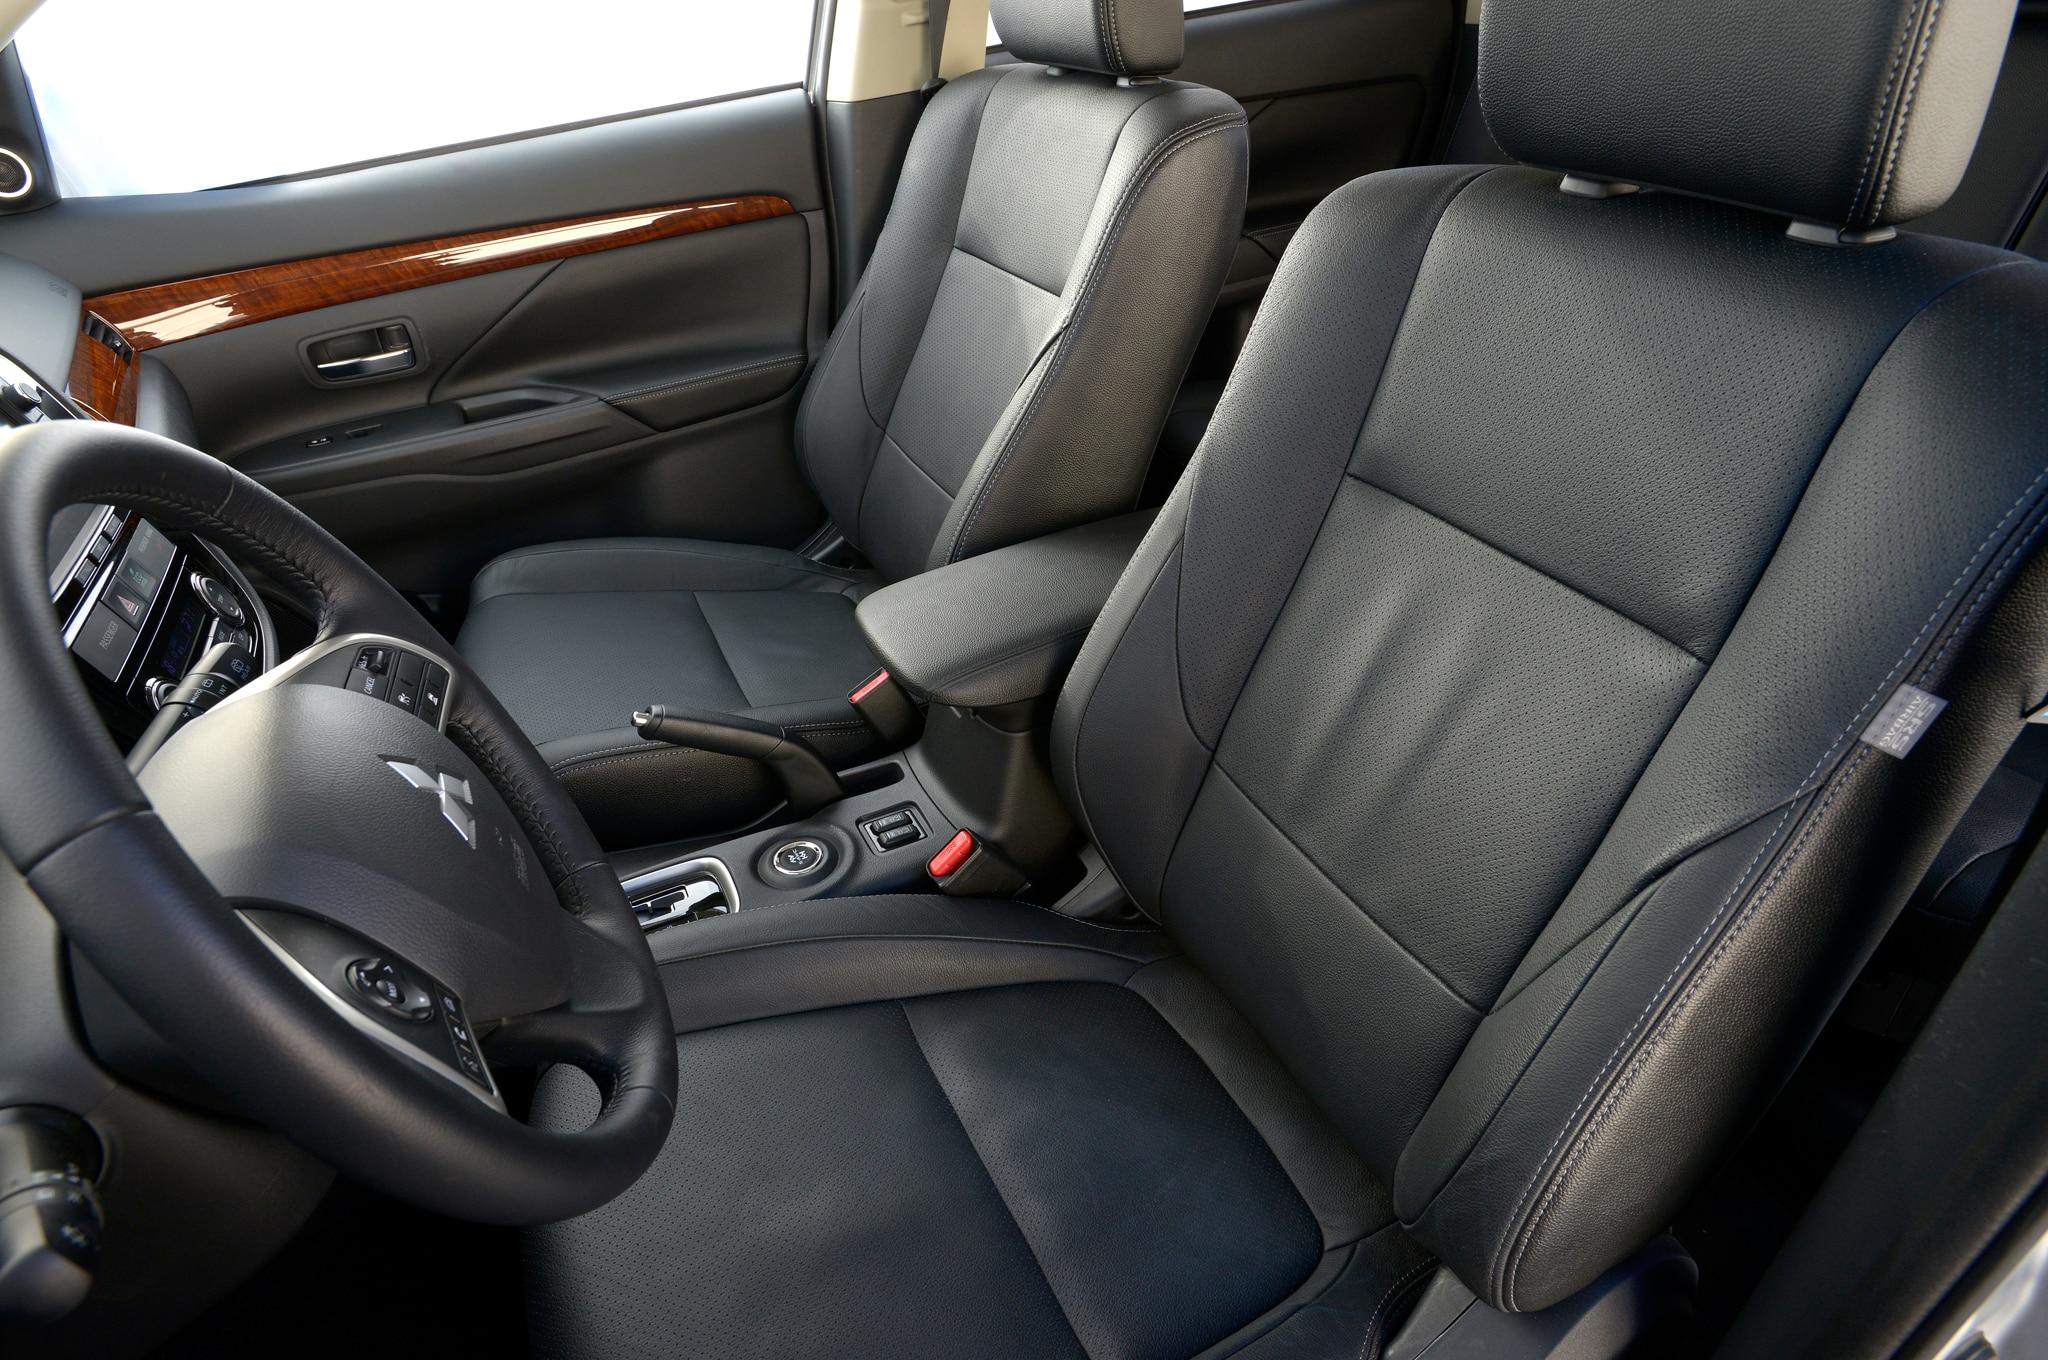 2014 mitsubishi outlander first drive automobile magazine for Mitsubishi outlander interior